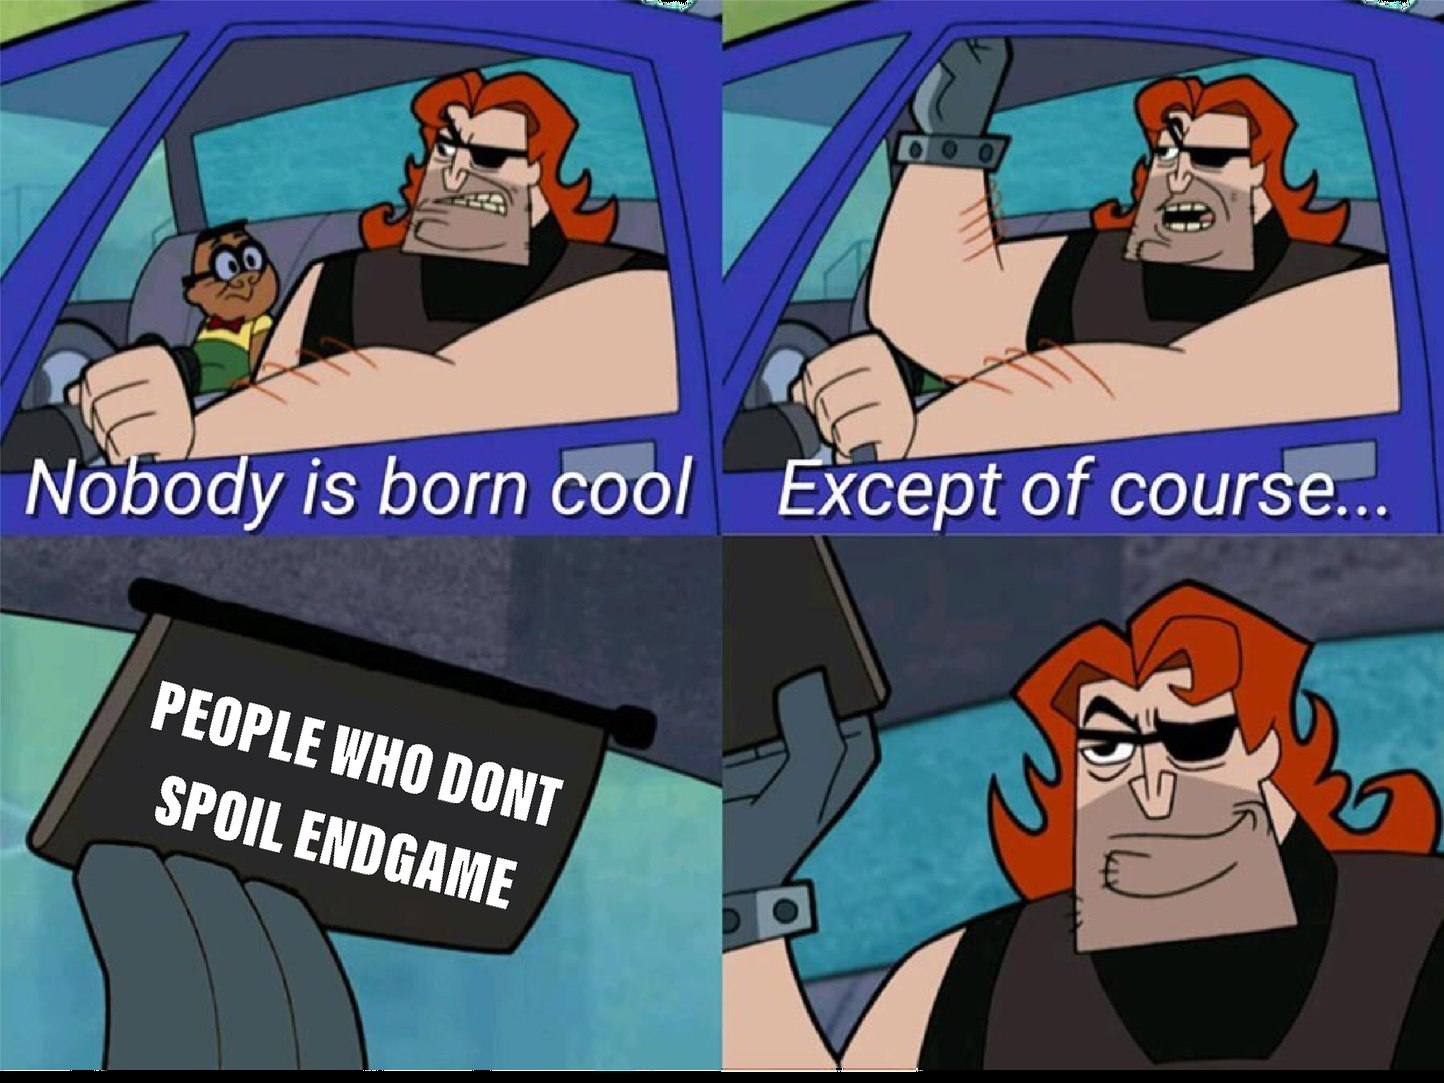 People who don't spoil endgame=cool - meme